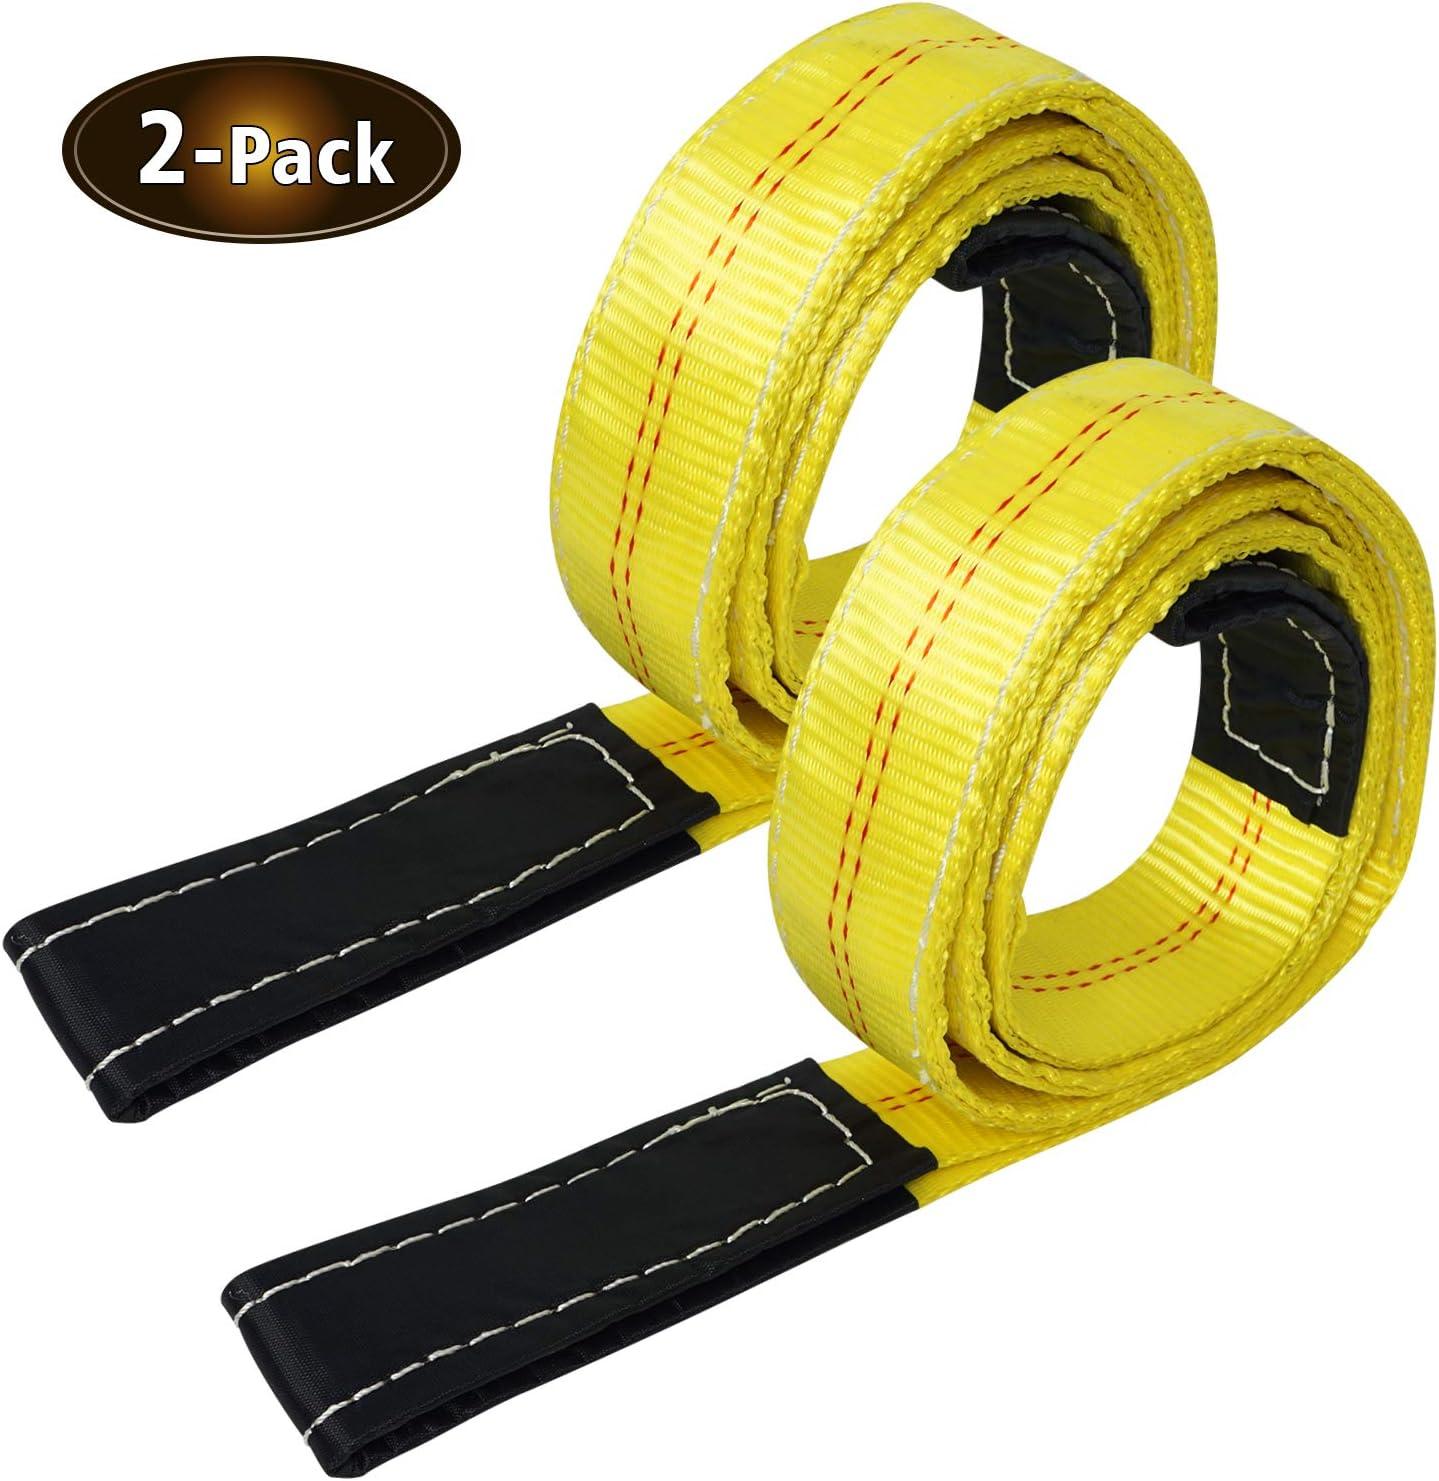 Tow Strap with HOOK winch sling ATV UTV